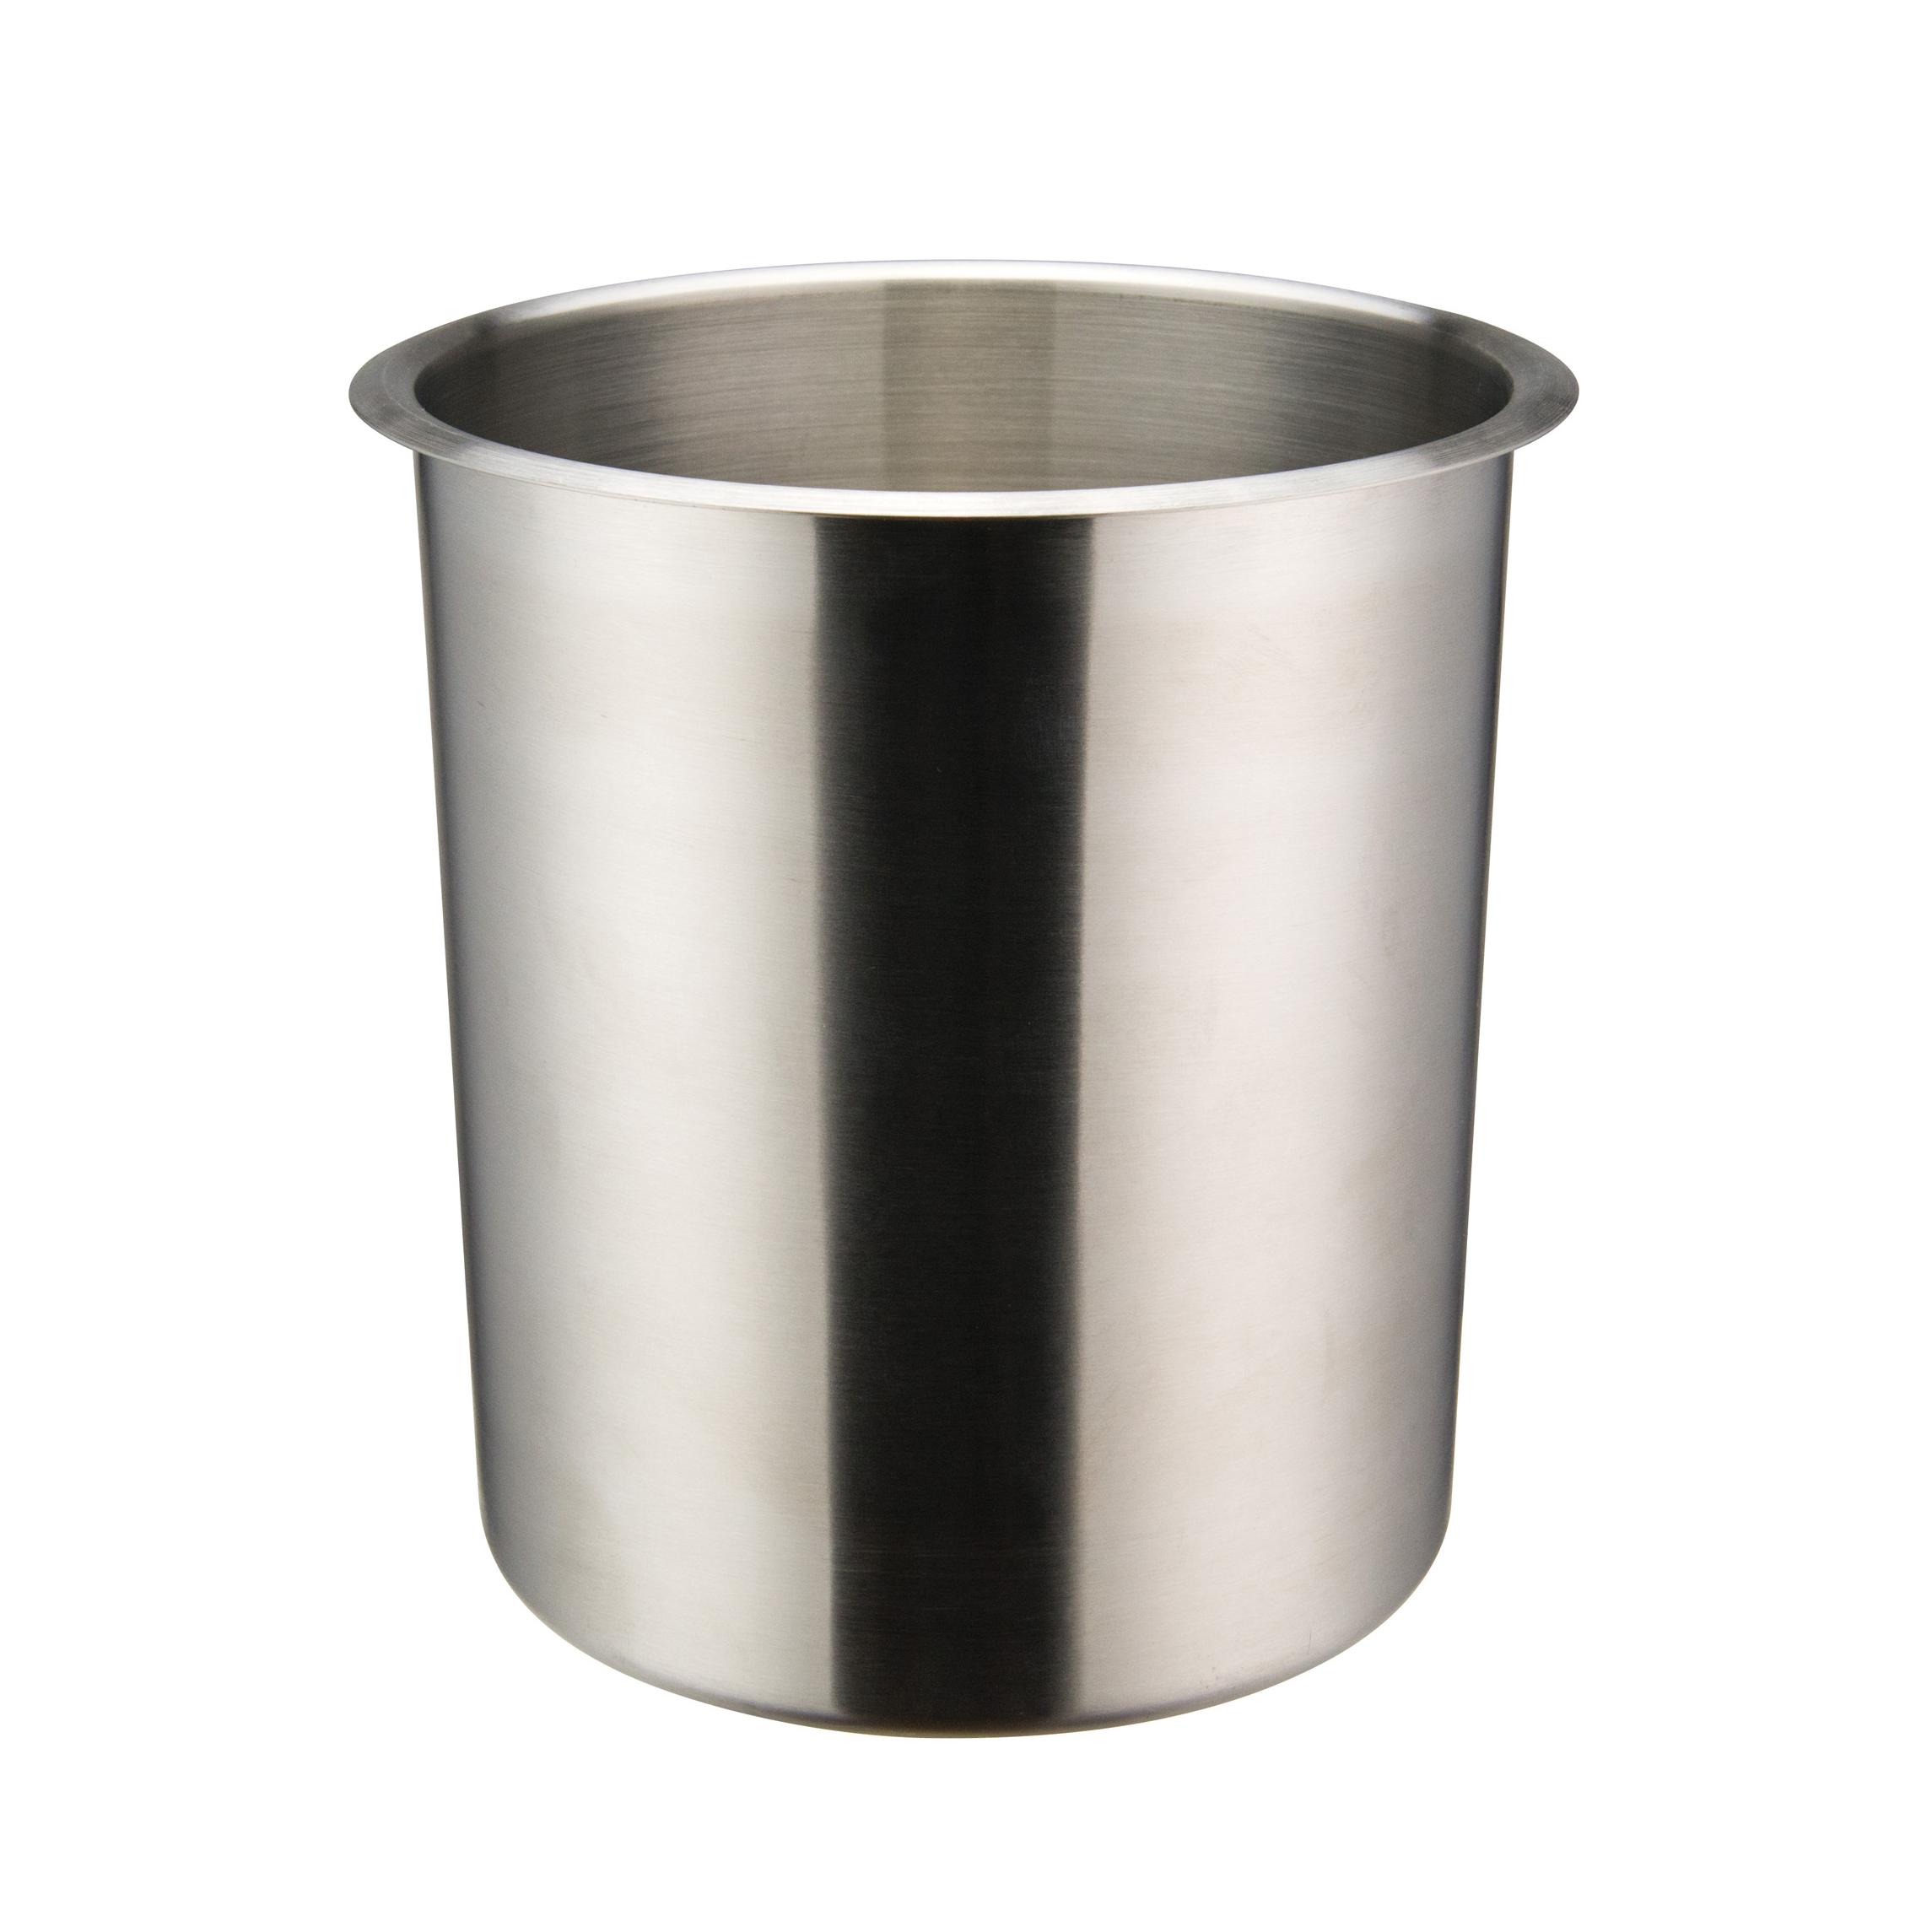 2400-18 Winco BAM-4.25 bain marie pot